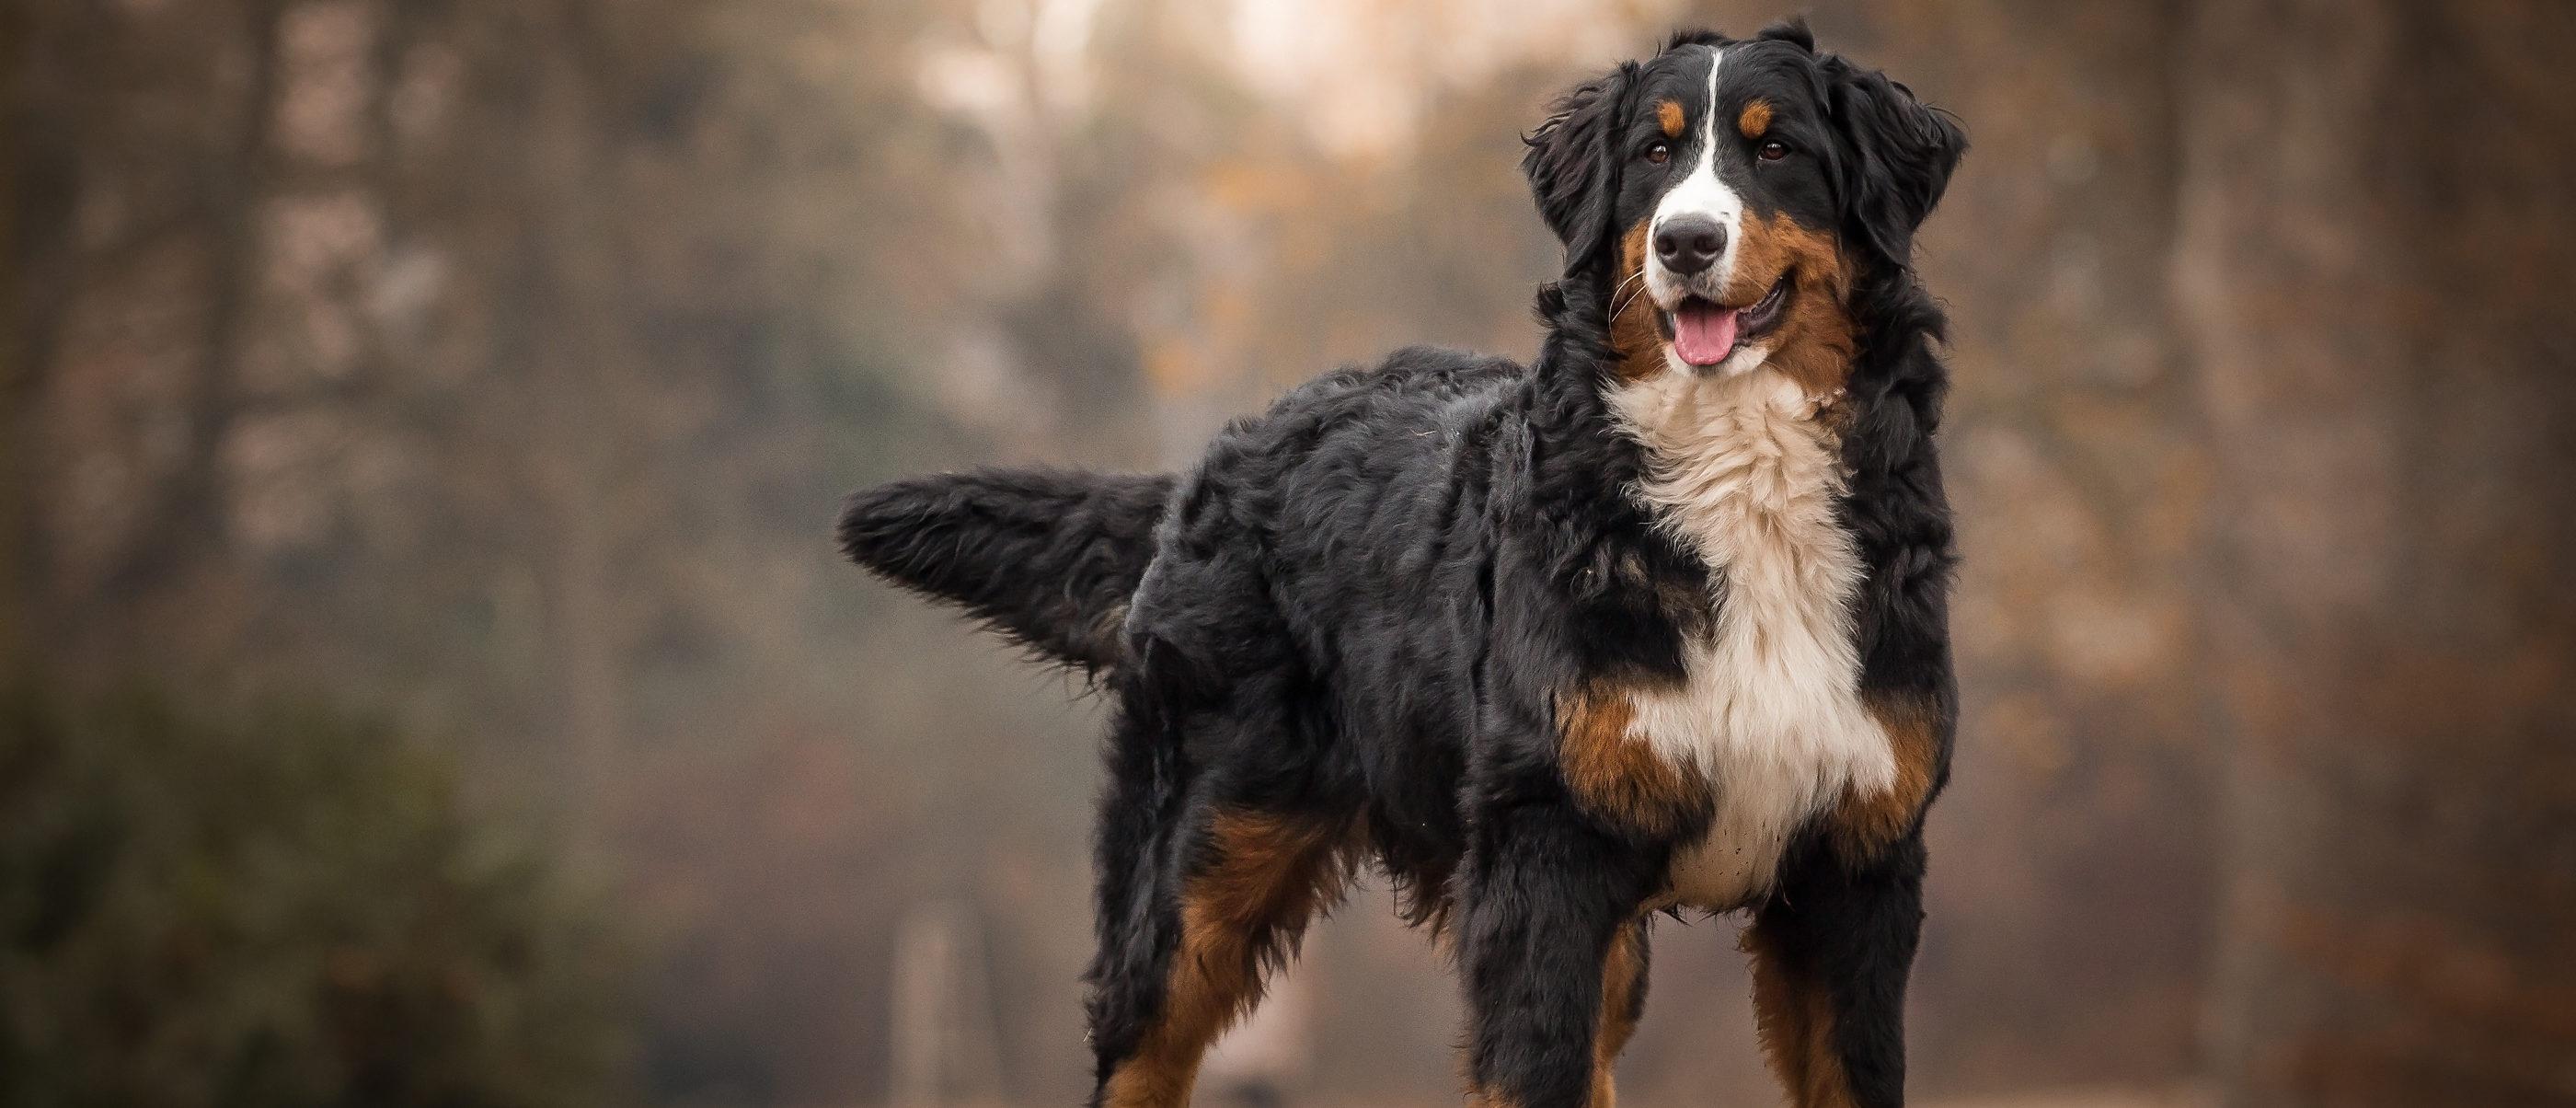 Bernese mountain dog (Photo: Shutterstock)